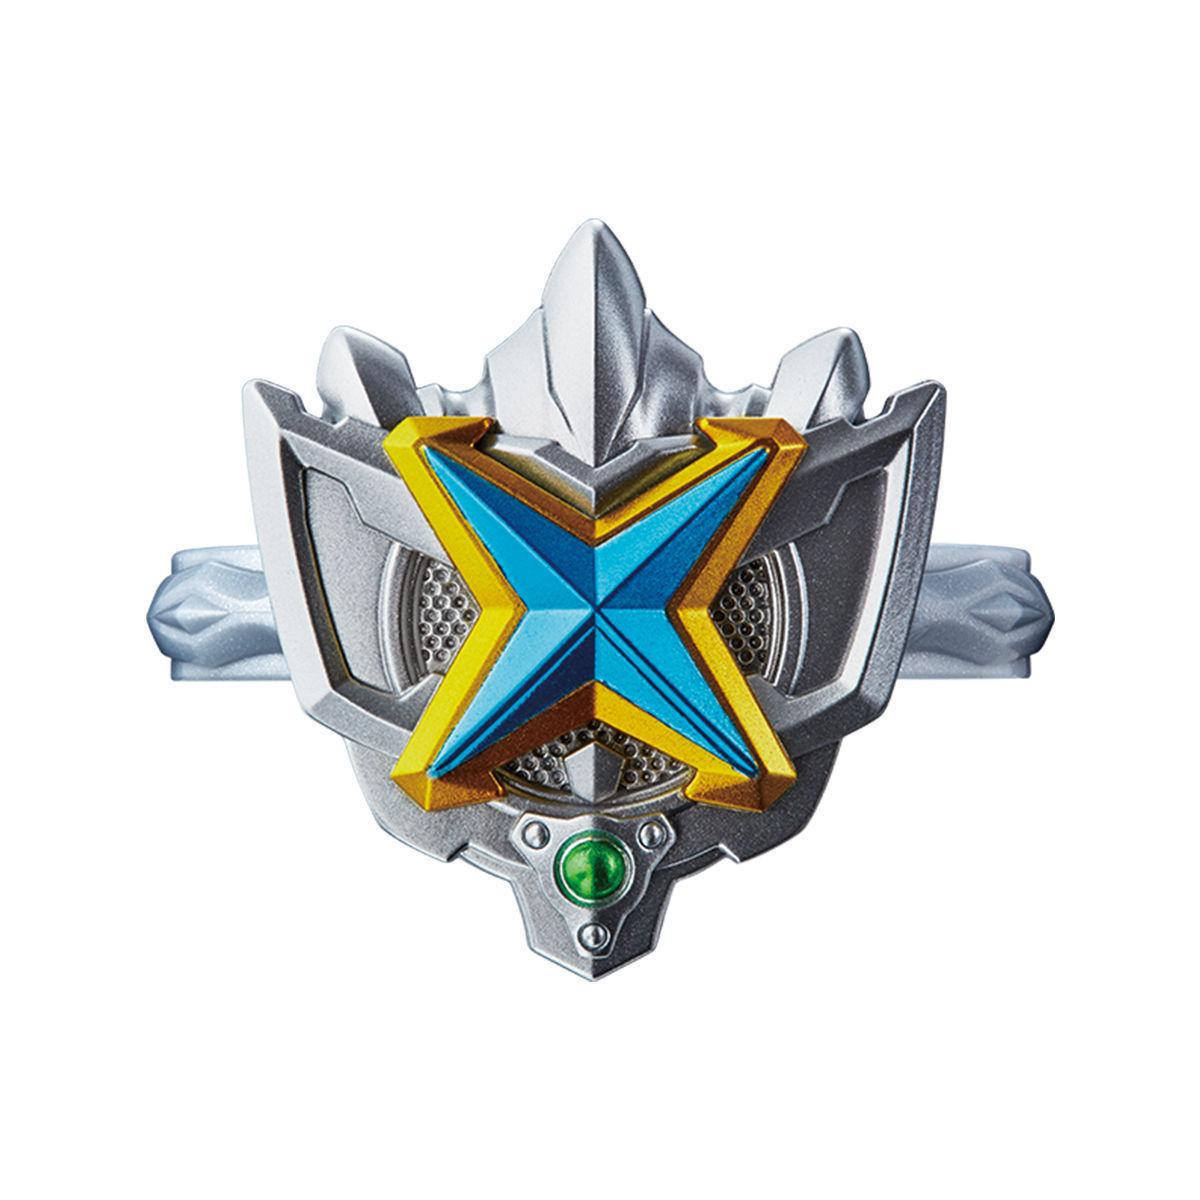 DXウルトラタイガアクセサリーセット02